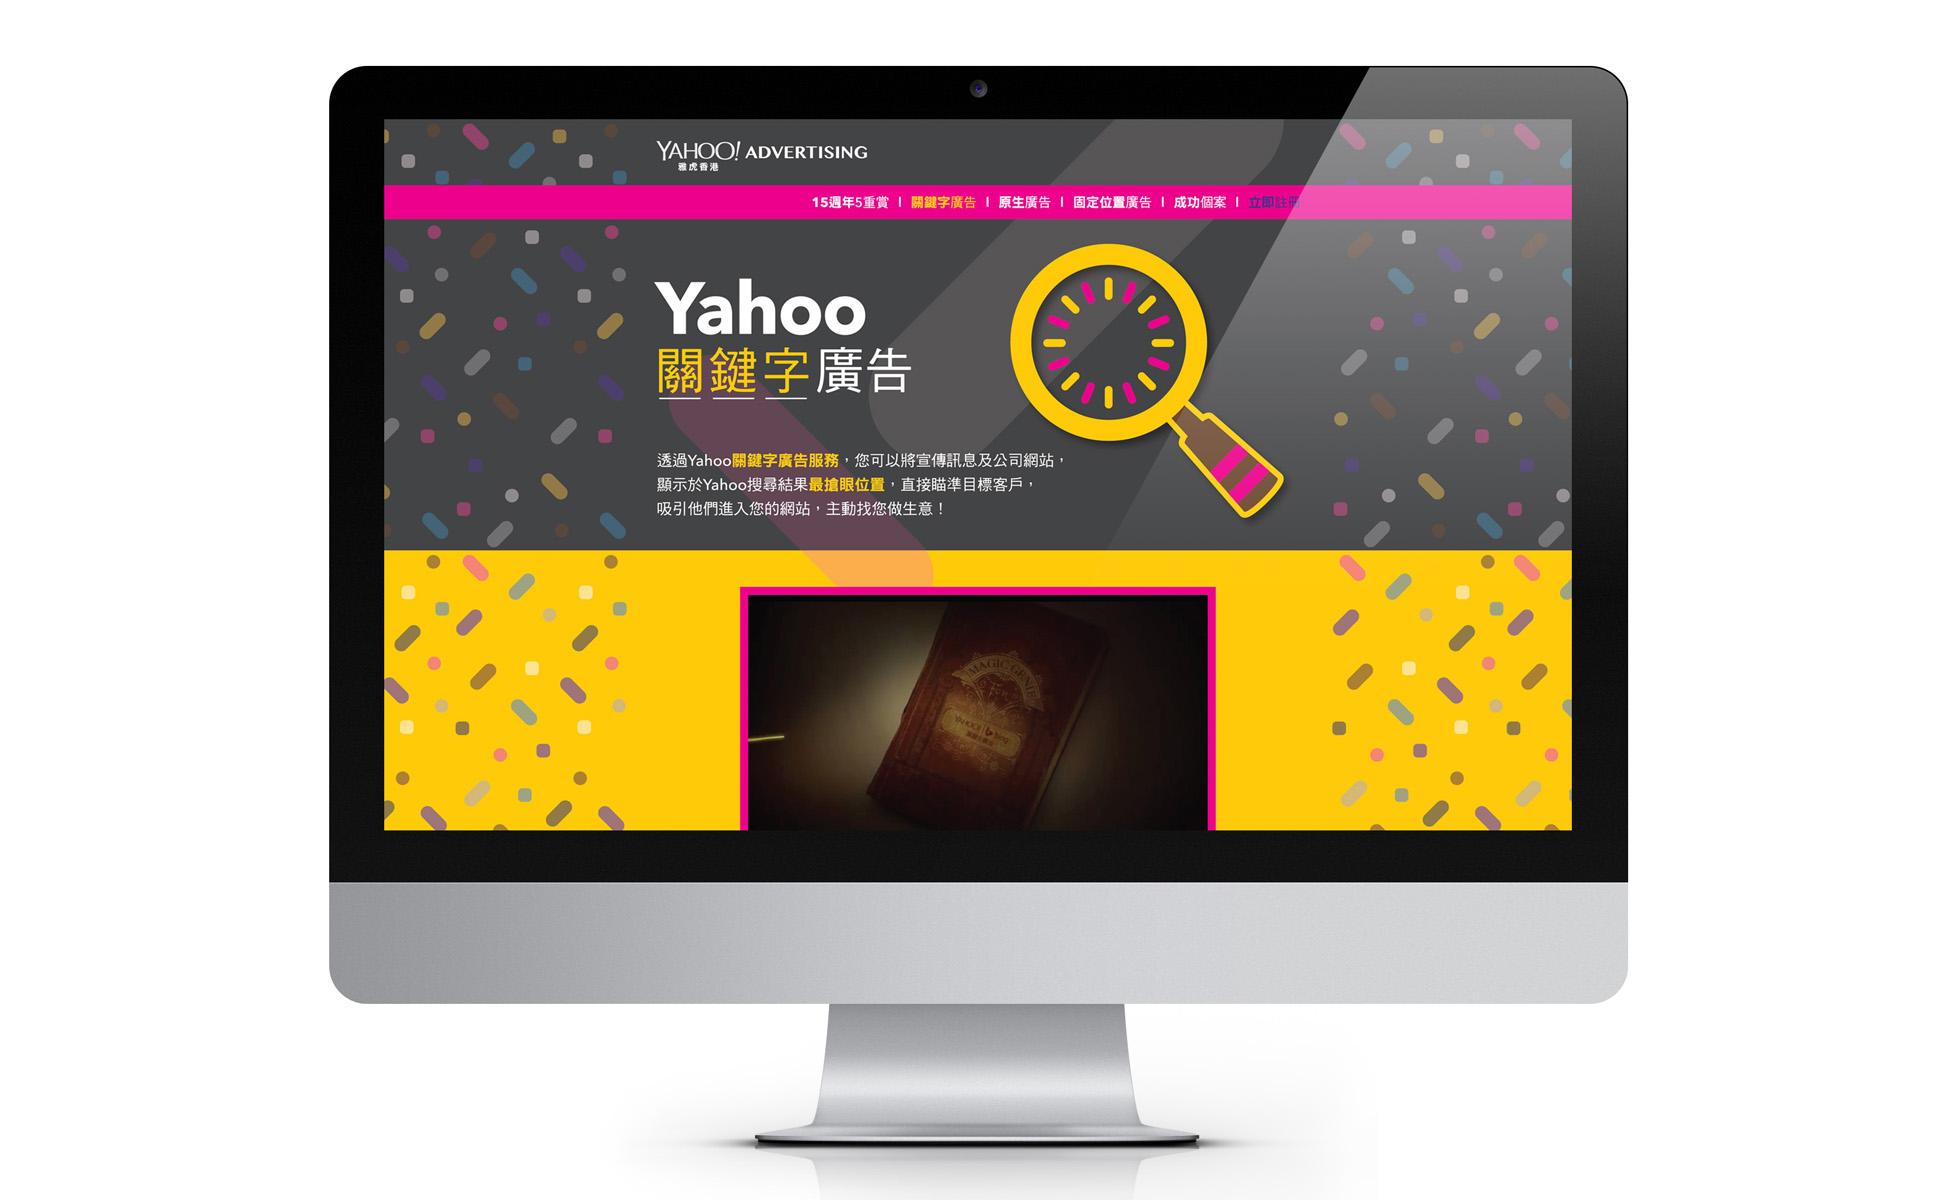 Yahoo_iMac-6.jpg